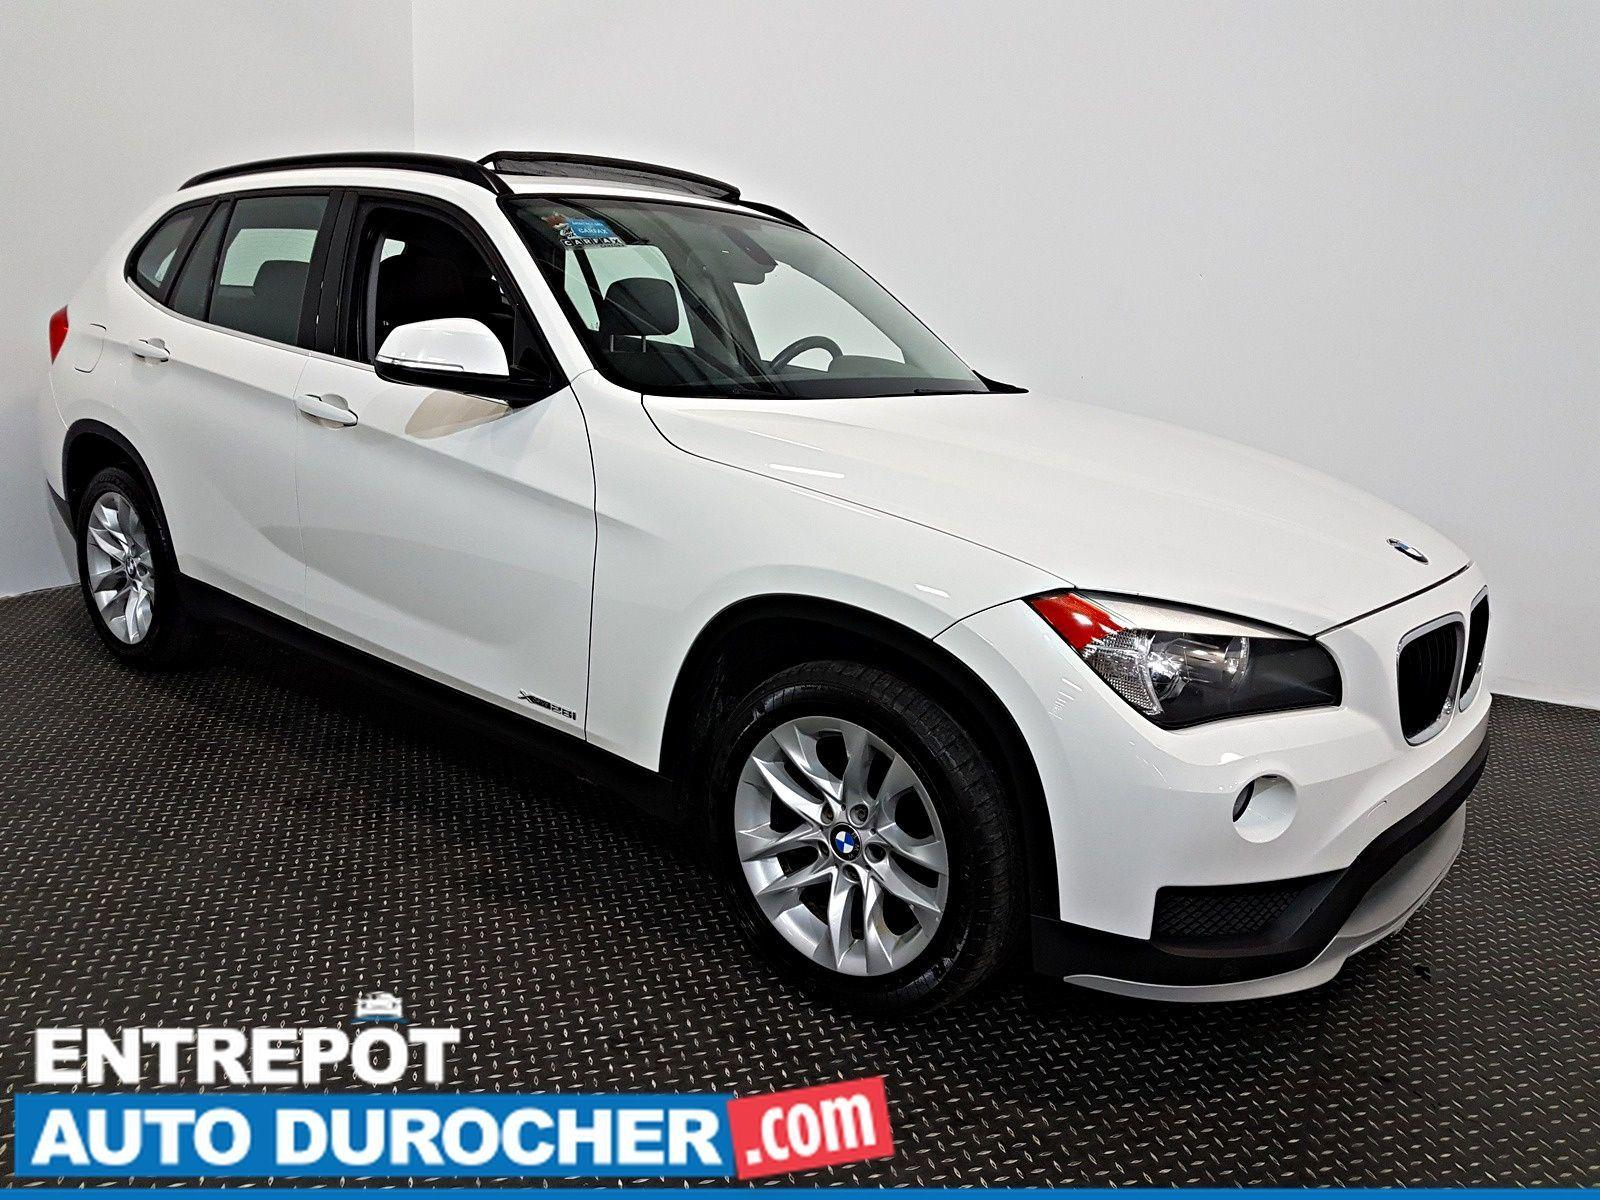 2015 BMW X1 XDrive28i - AUTOMATIQUE - AWD - TOIT PANORAMIQUE SIÈGES CHAUFFANTS - CUIR